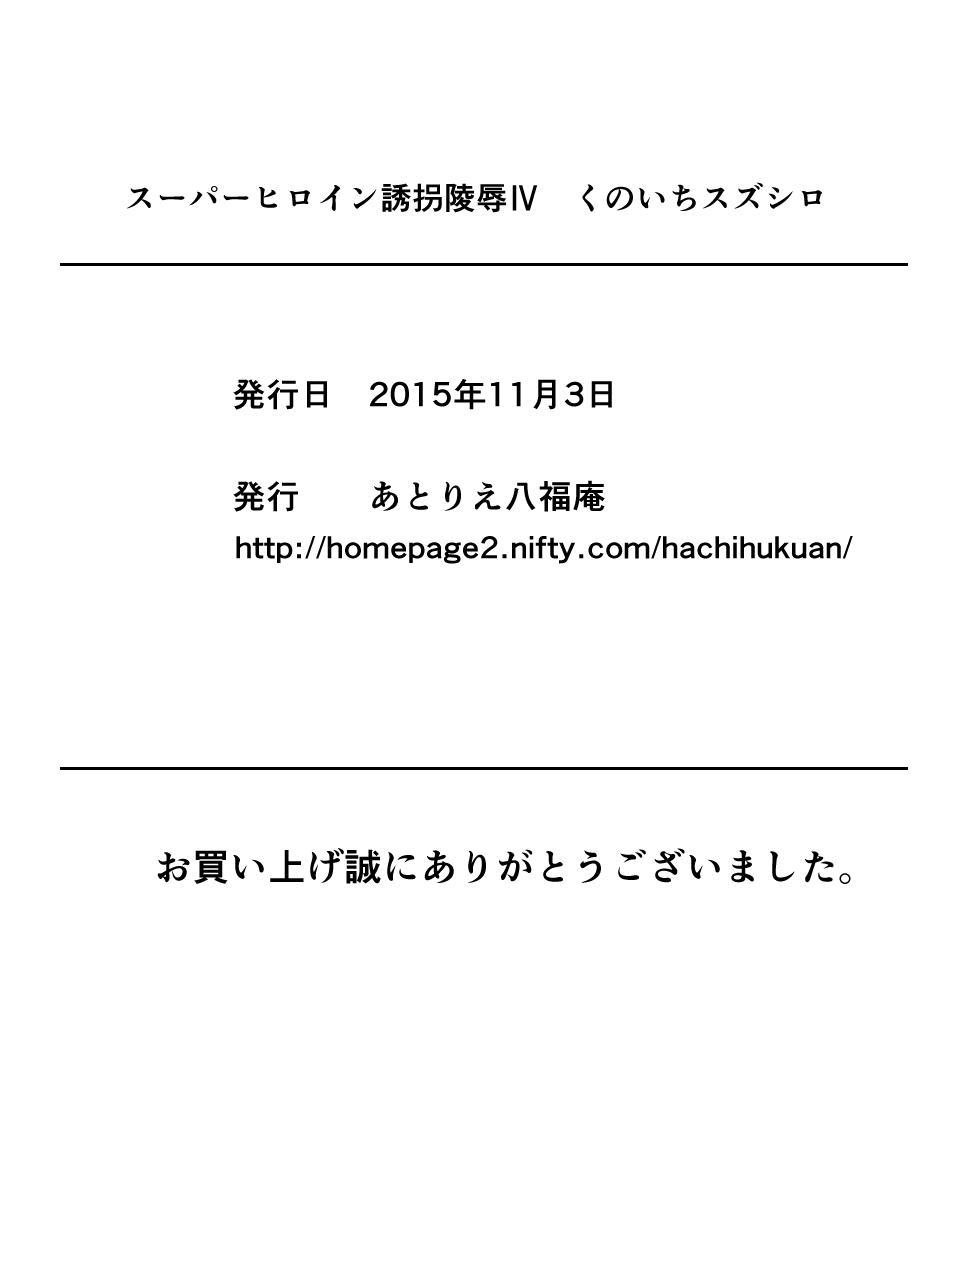 [Atelier Hachifukuan] Superheroine Yuukai Ryoujoku IV - Superheroine in Distress - Kunoichi Suzushiro [English] [Harasho Project] 35